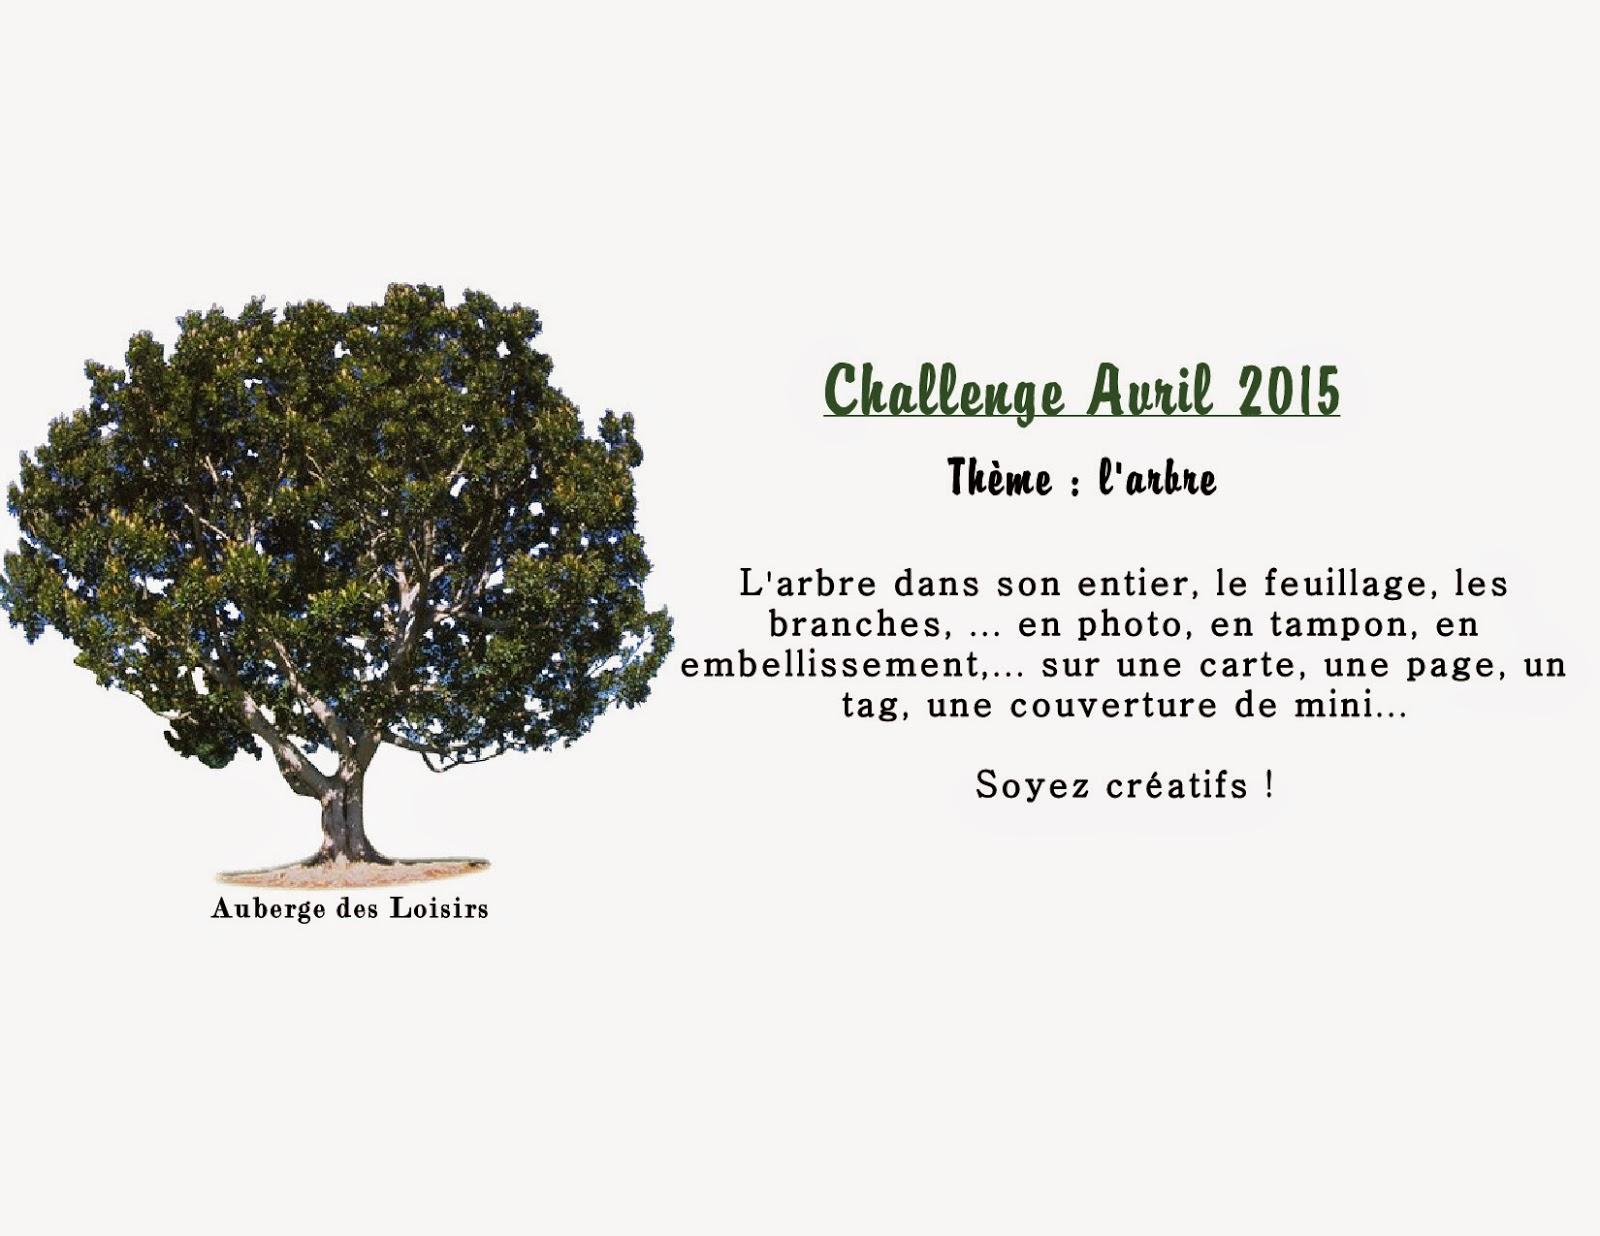 http://www.aubergedesloisirs.blogspot.fr/2015/04/challenge-avril-2015.html